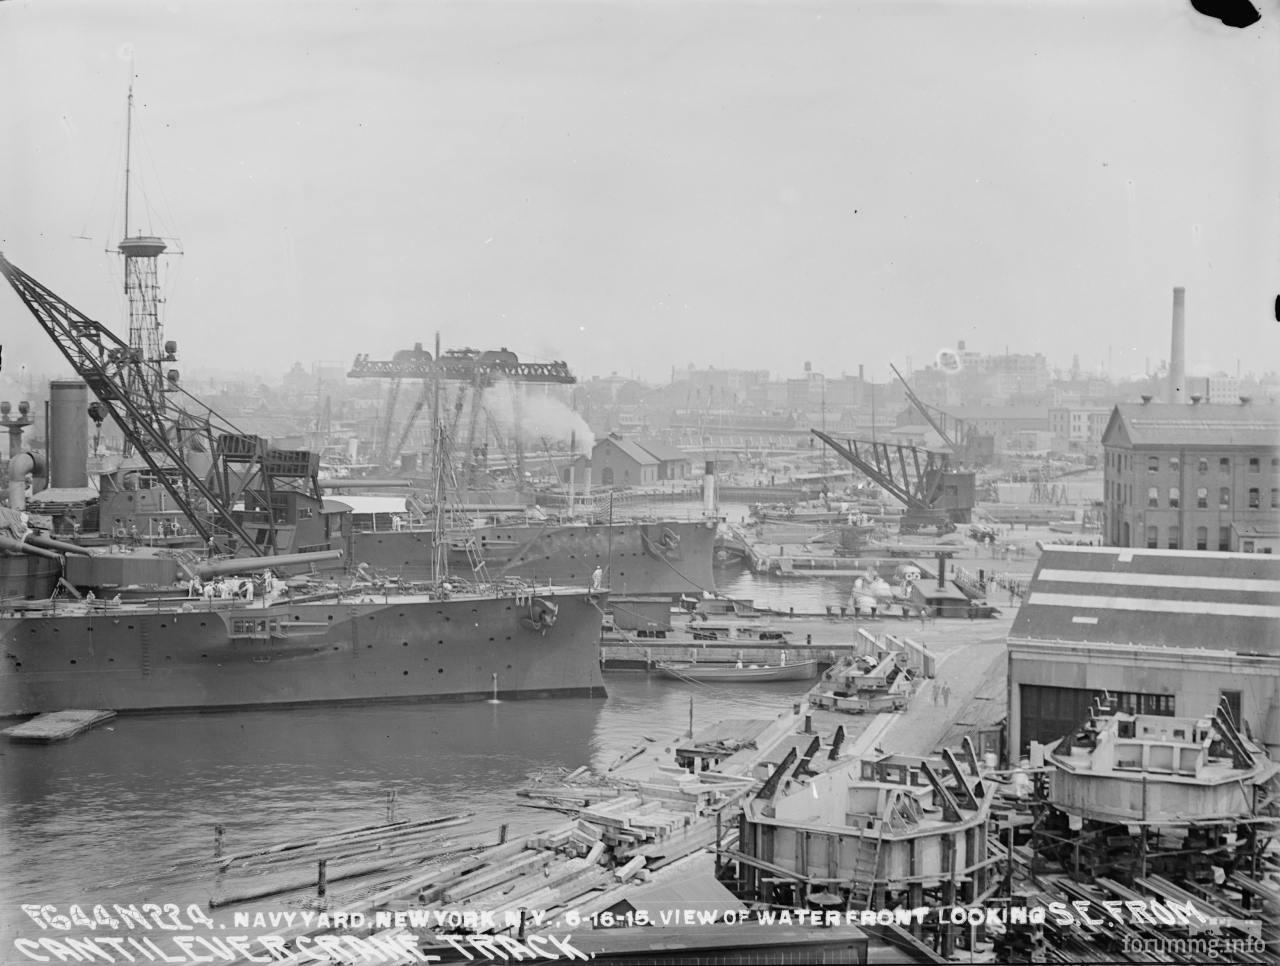 117419 - USS Wyoming (BB-32) и USS Arkansas (BB-33) на Бруклинской верфи, 16 июня 1915 г.